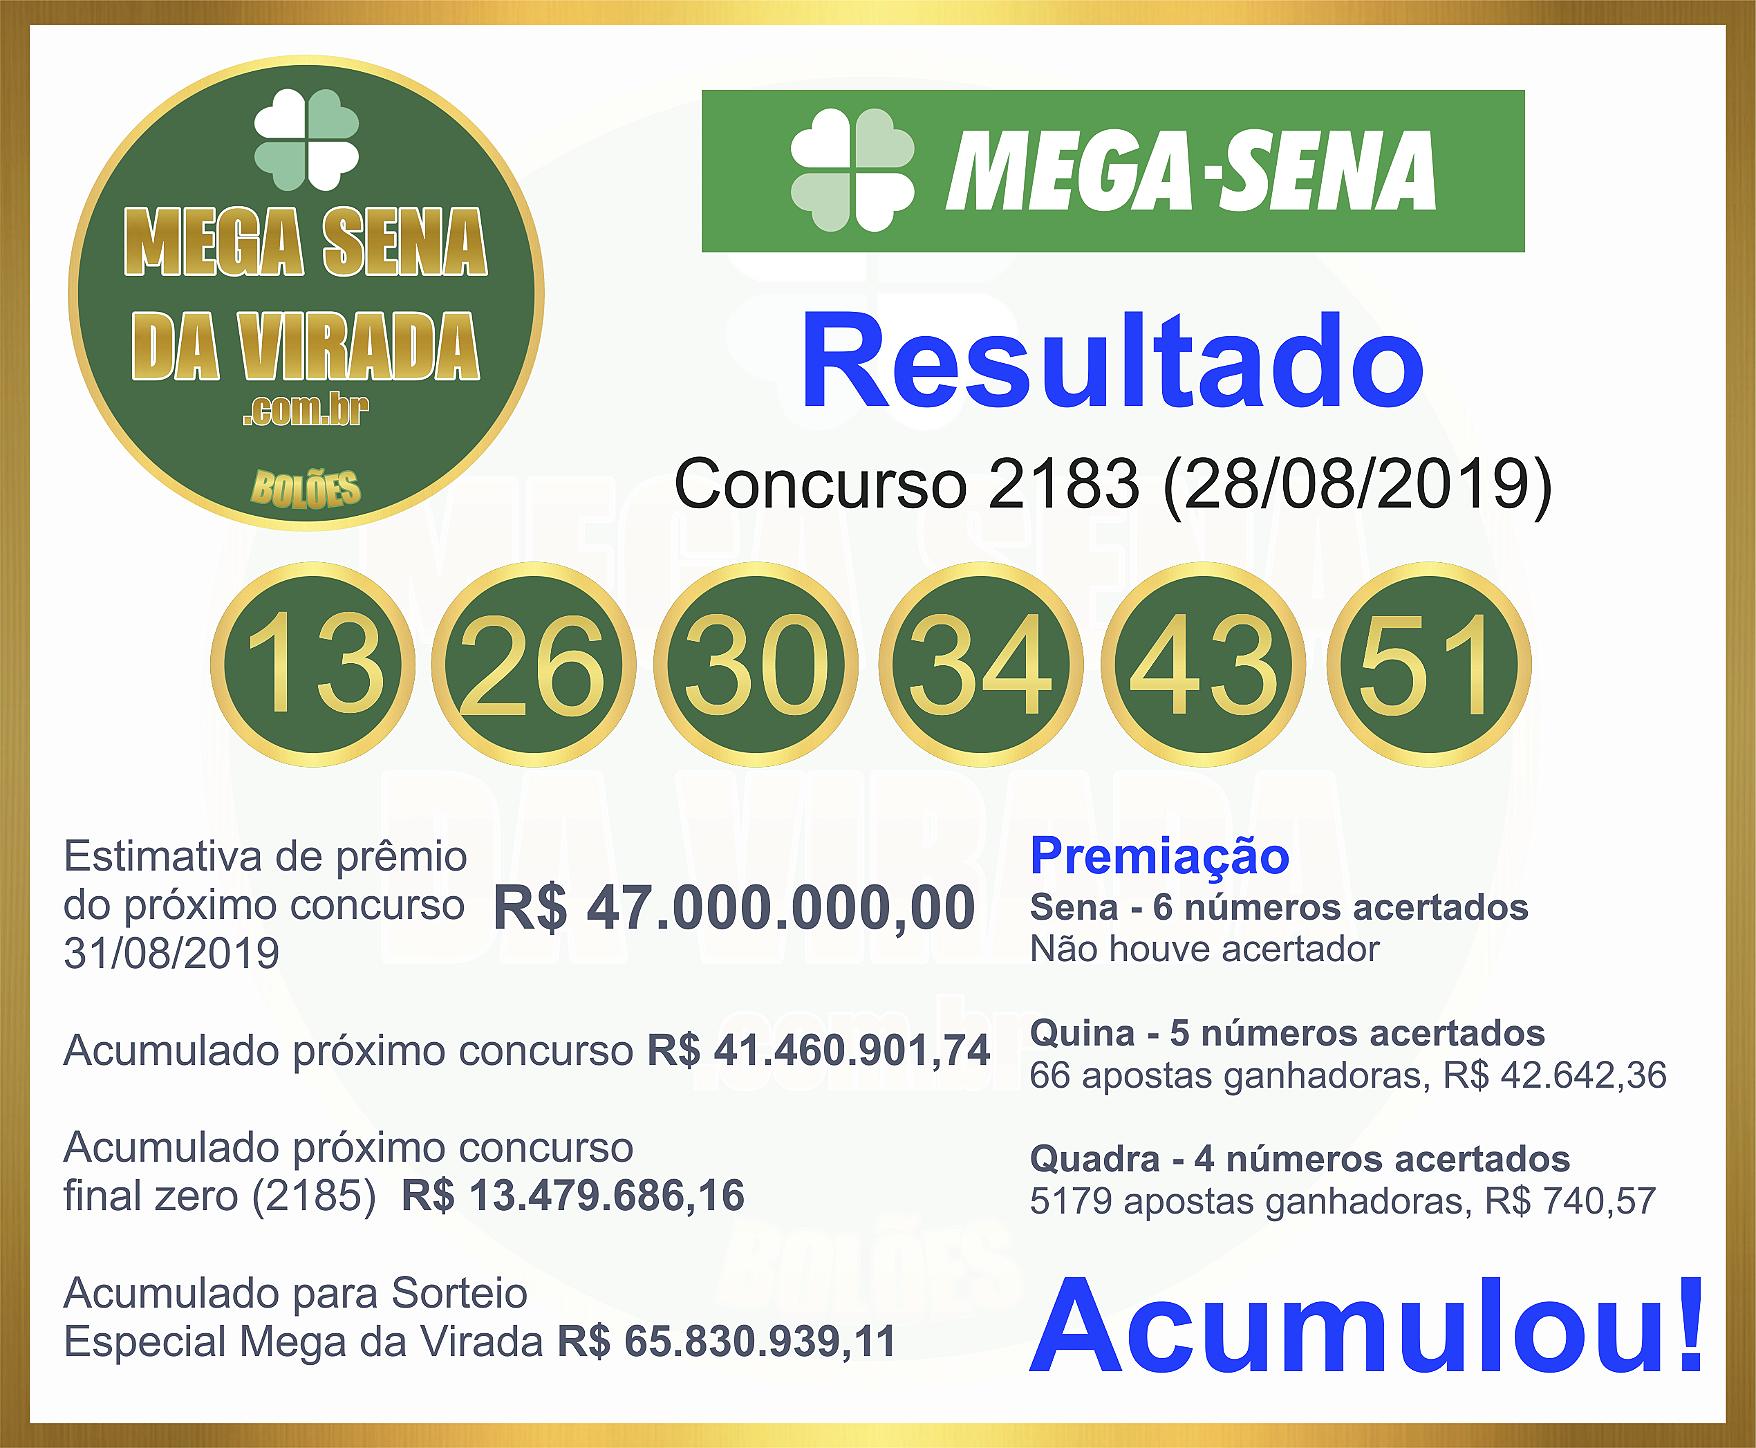 Mega Sena Concurso 2183 28/08/2019